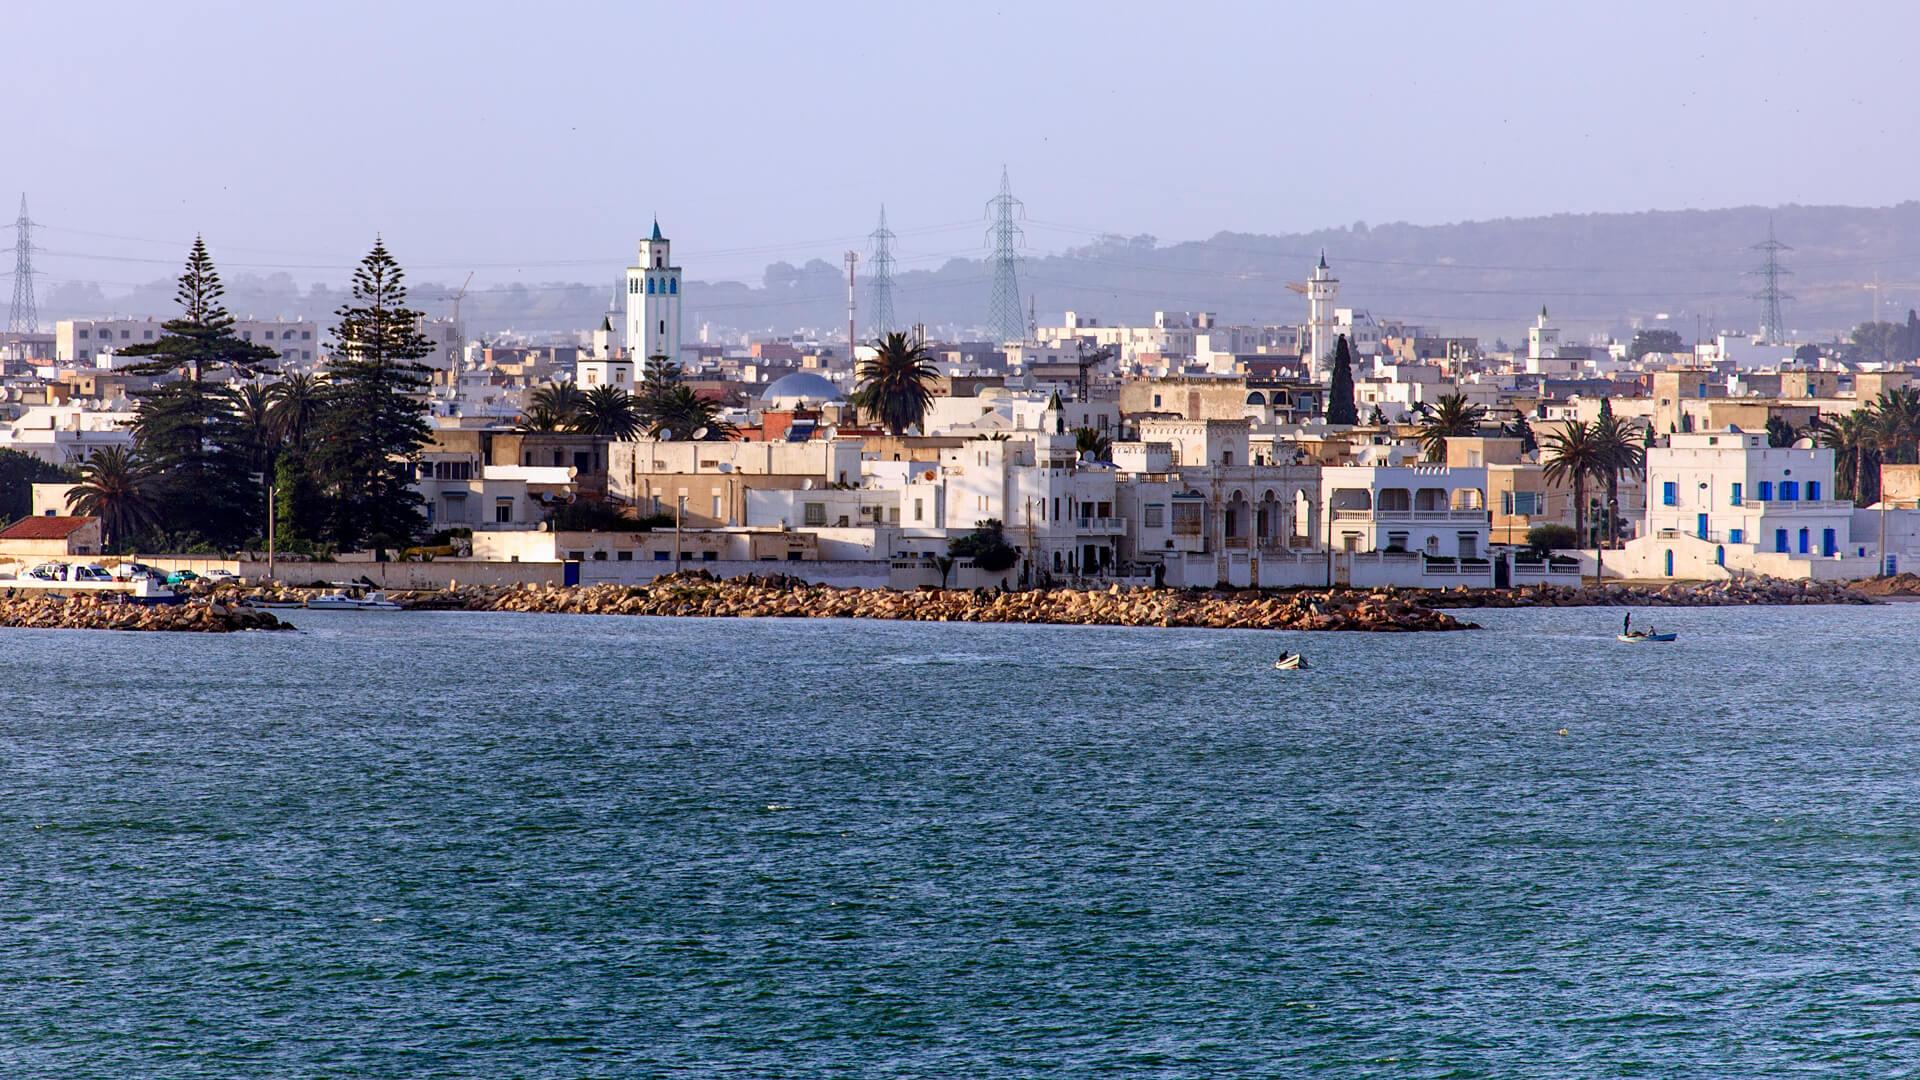 Tunisie, entre mer et désert